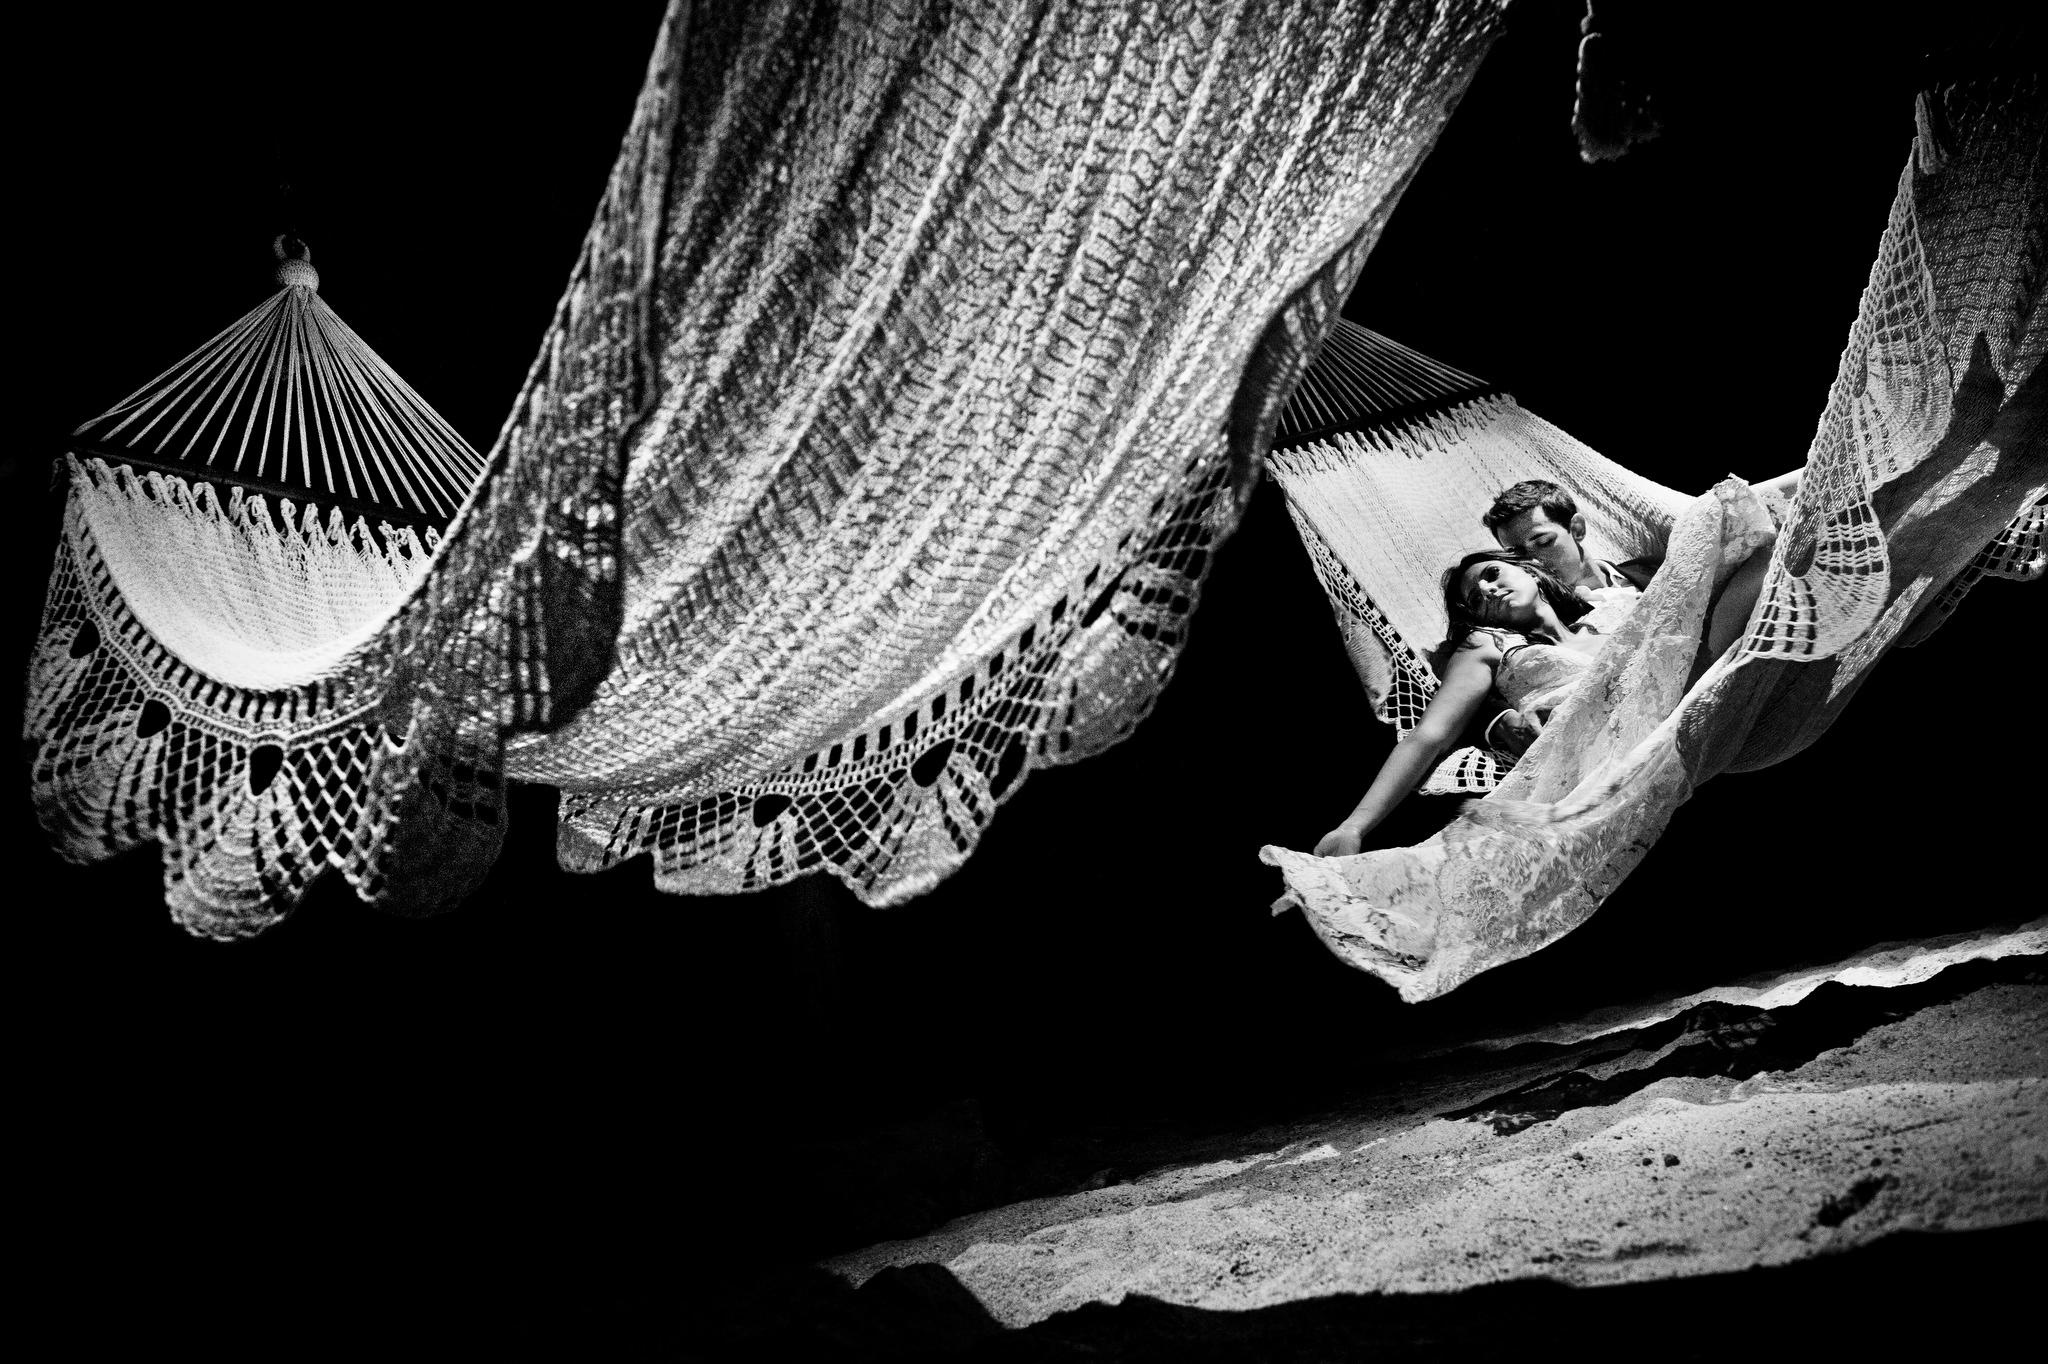 Couple lying in hammock by Ben Chrisman of Chrisman Studios